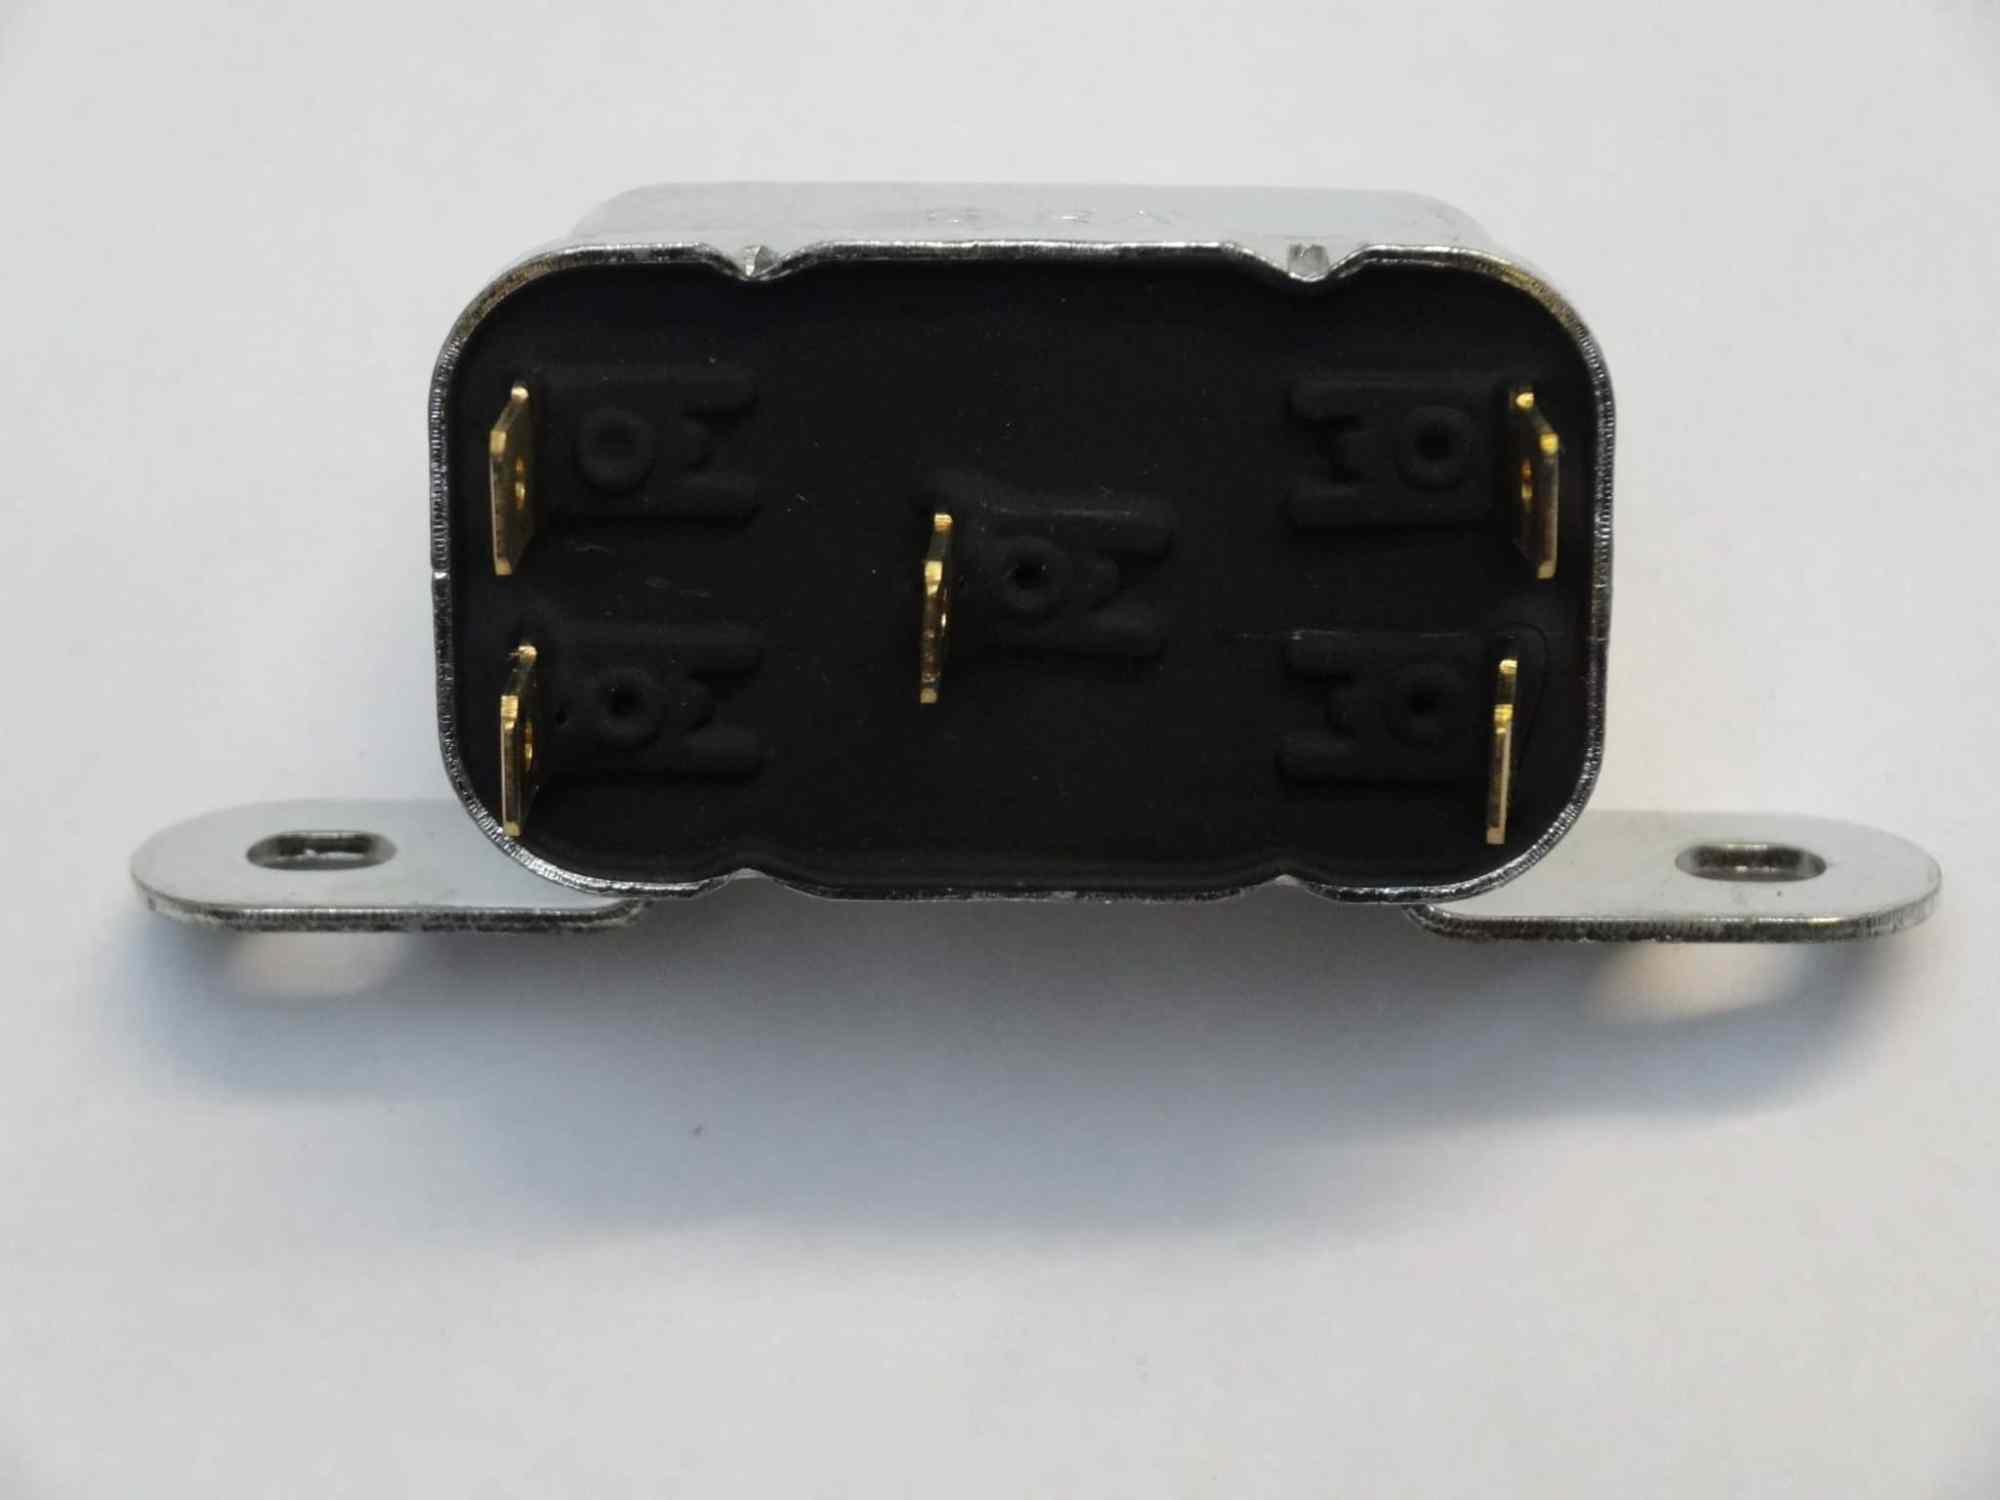 hight resolution of headlight relay 12 volt image 2